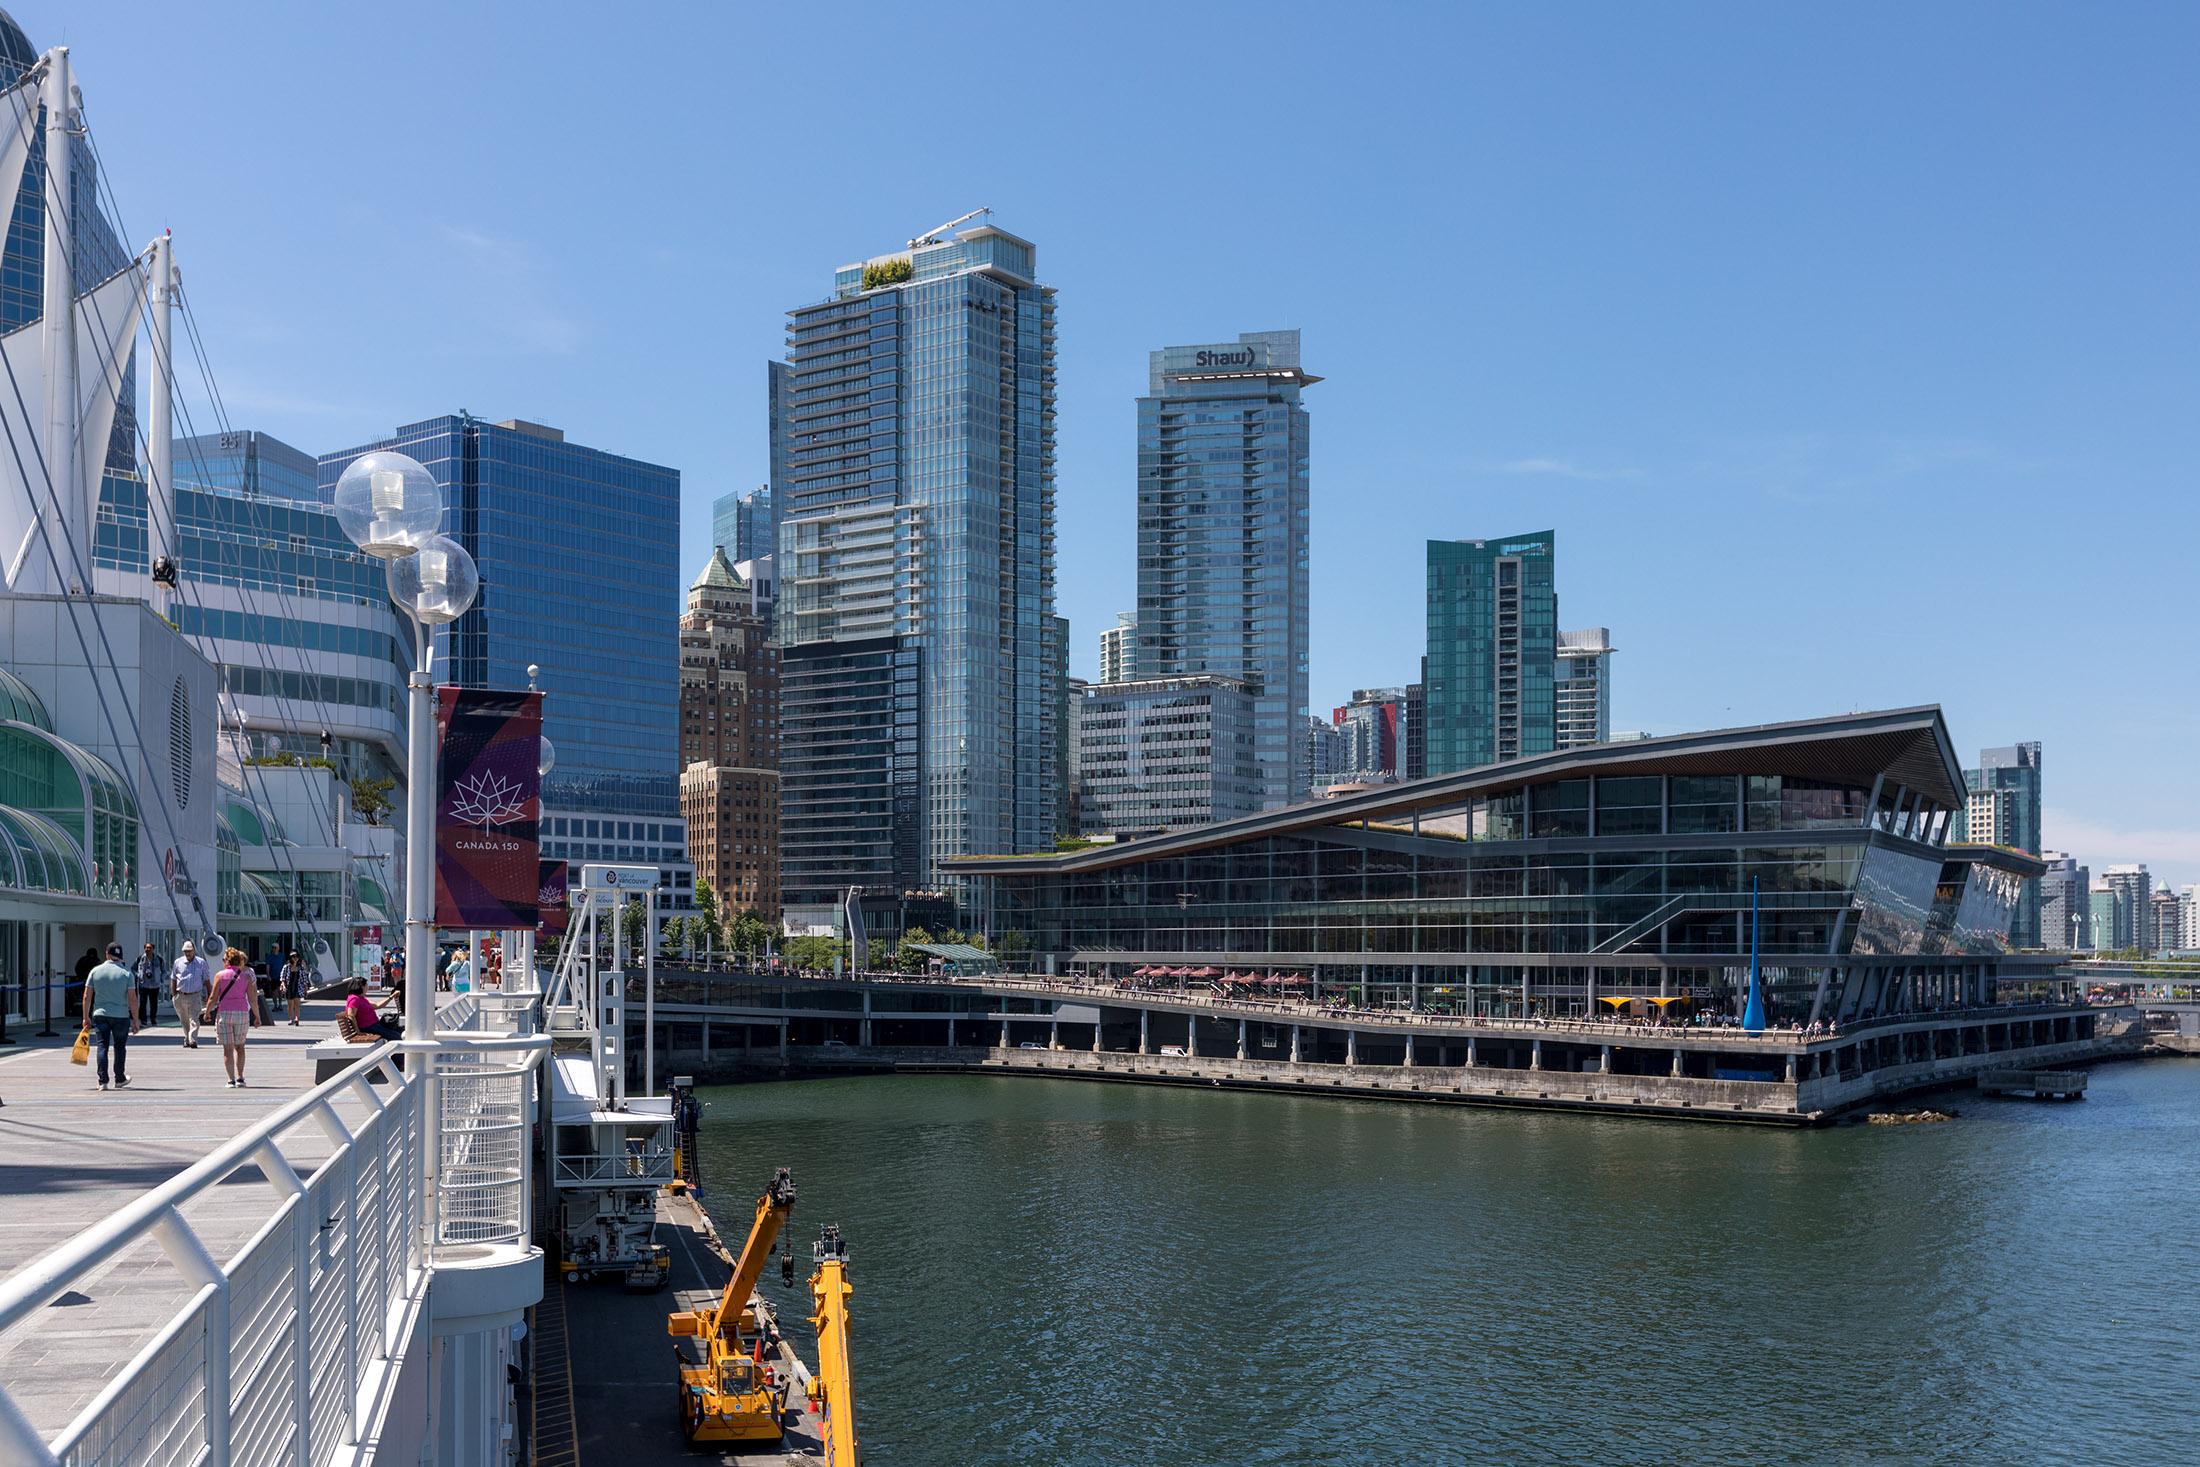 Vancouver Convention Centre - Coal Harbour neighbourhood